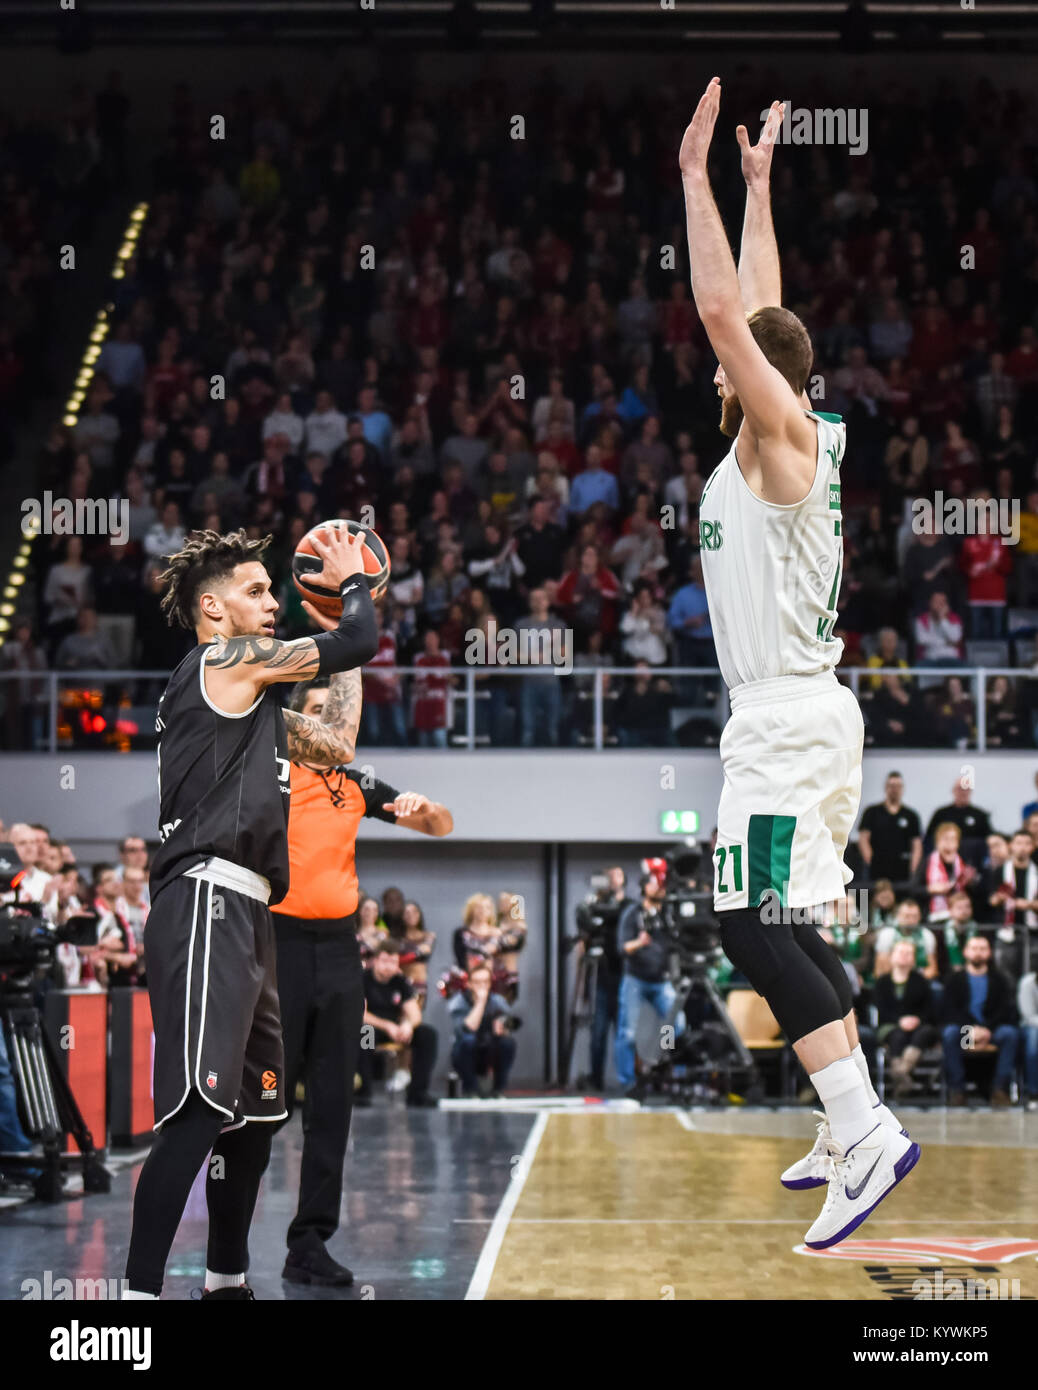 Bamberg, Germany. 16th Jan, 2018. Germany, Bamberg, Brose Arena, 16.01.2018, Basketball - Euroleague - Round 18 - Stock Image